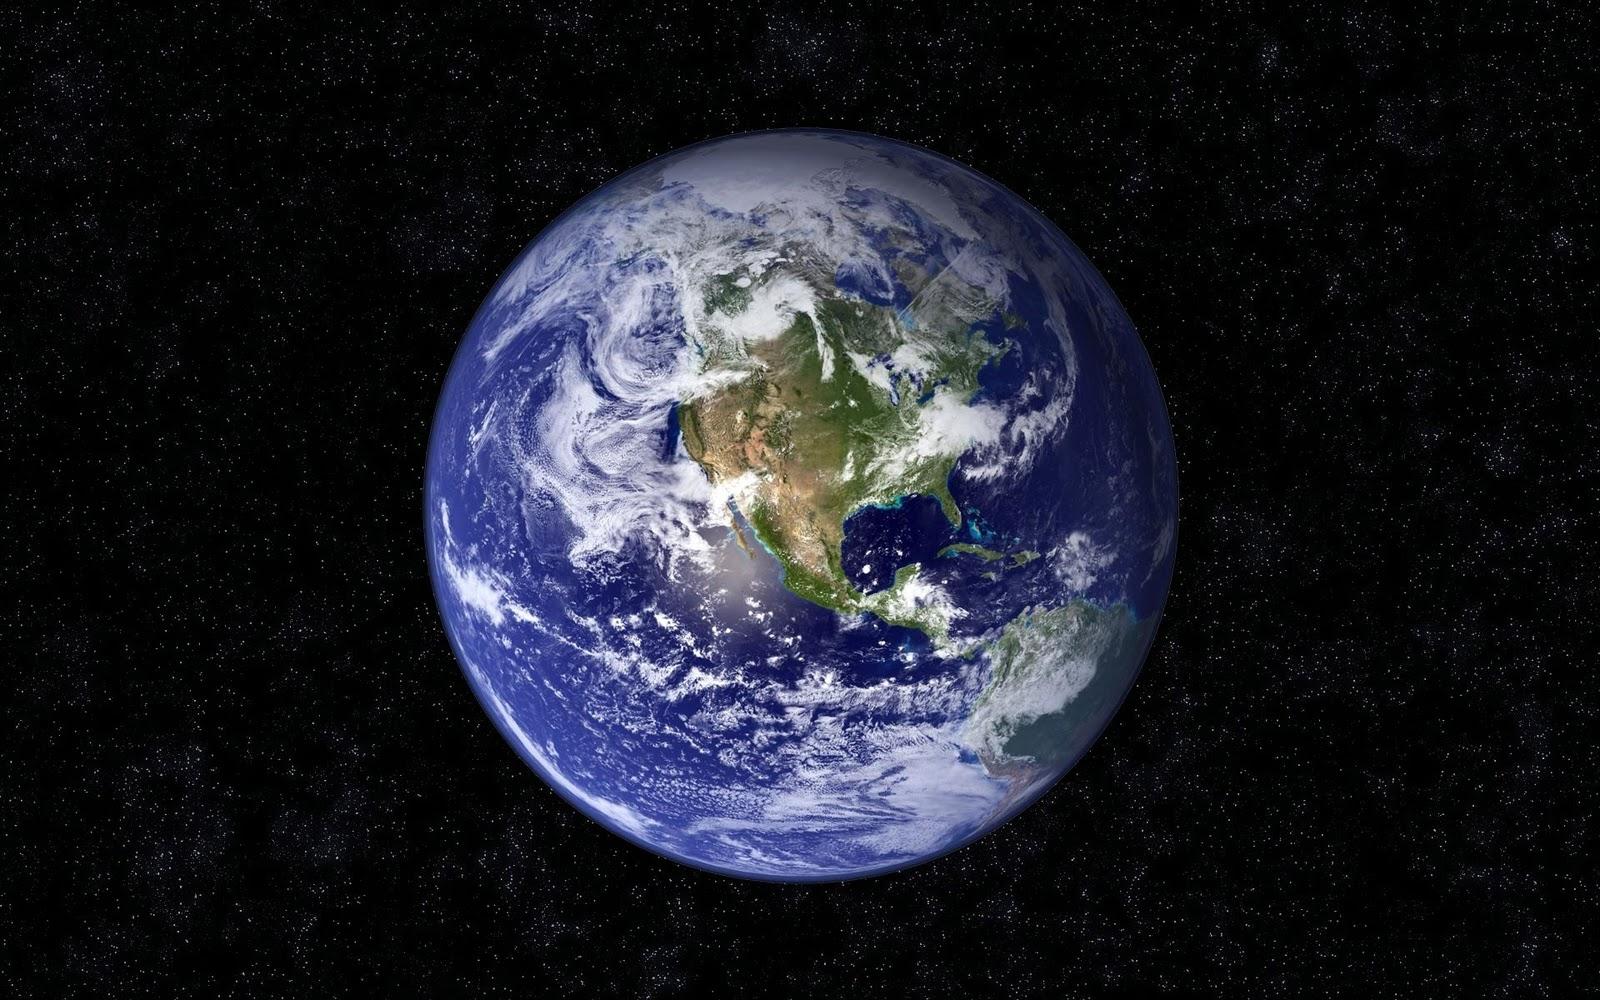 http://1.bp.blogspot.com/-ghC0RBPfrOE/TpRNlbyO1II/AAAAAAAACp8/M1qz-6me93k/s1600/space-wallpapers+hd-space-wallpaper-earth.jpg